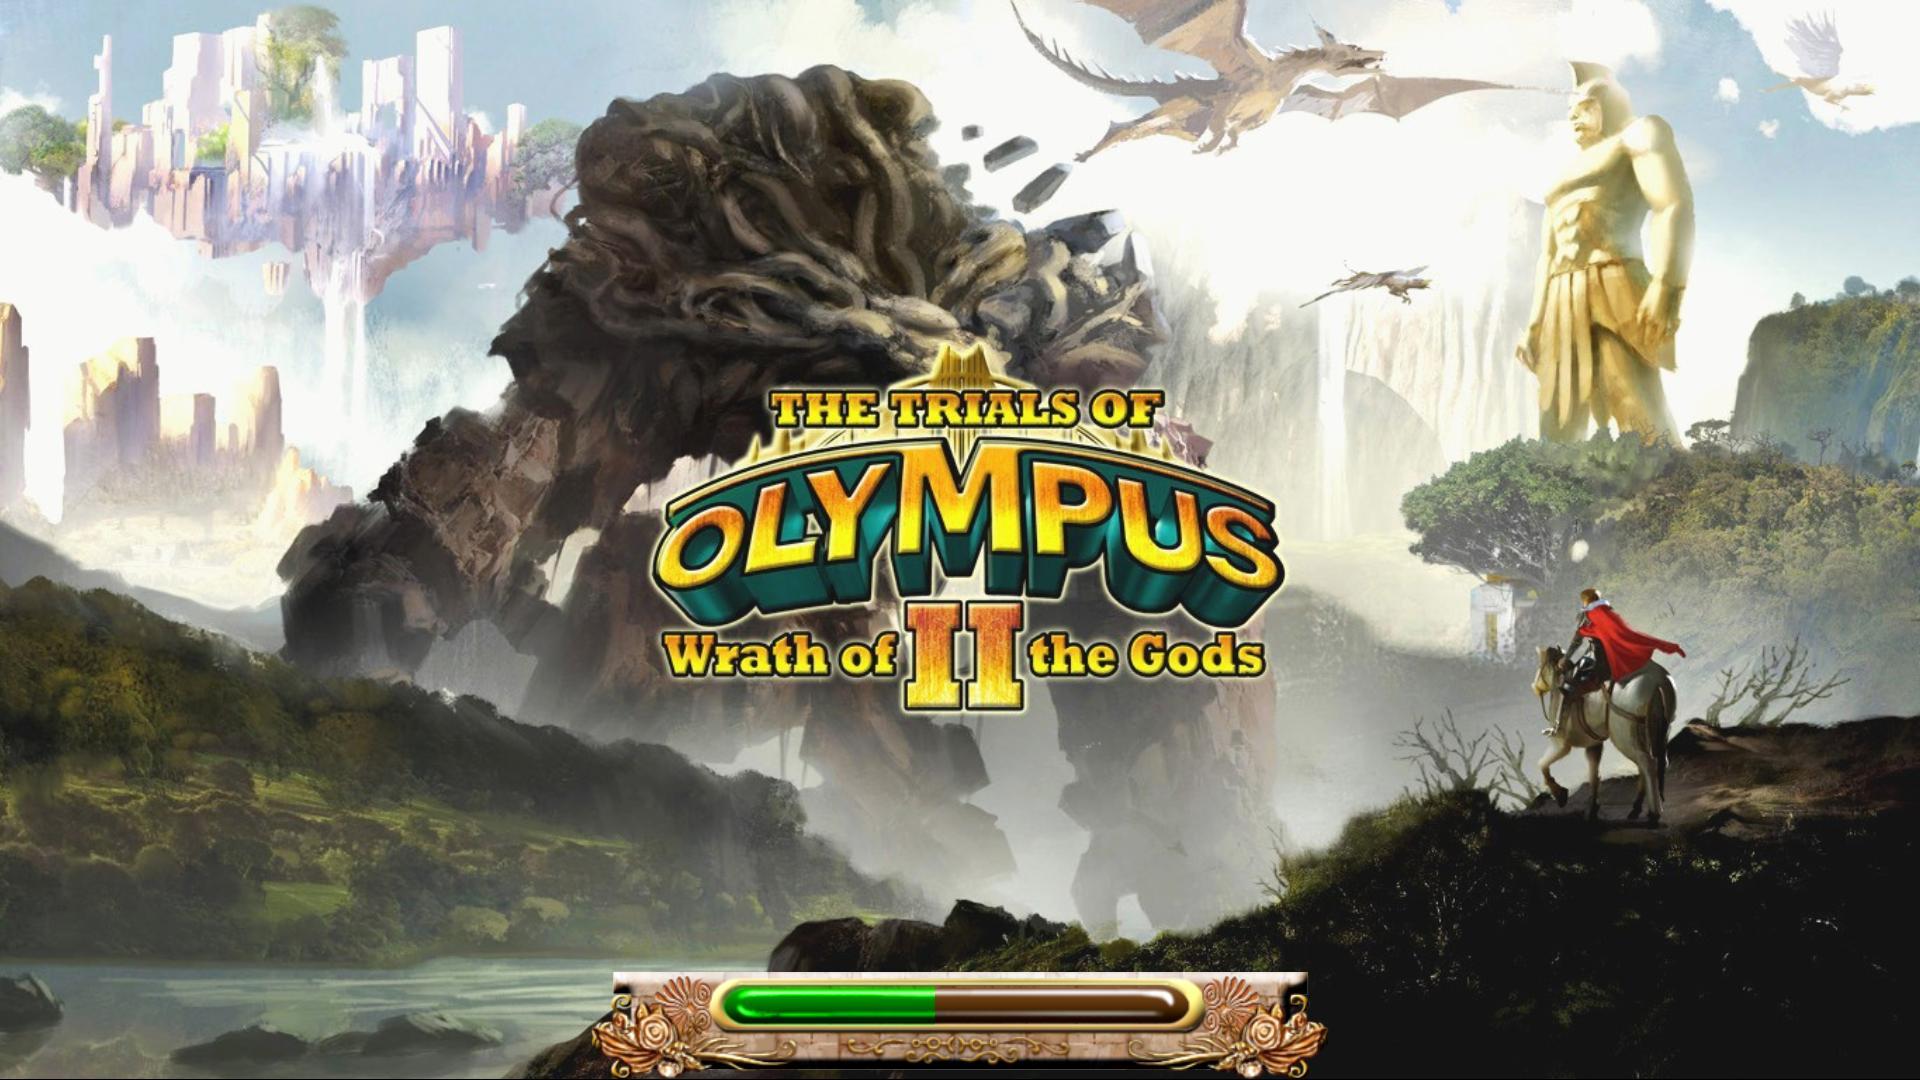 Испытания Олимпа 2: Гнев Богов   The Trials of Olympus II: Wrath of the Gods (En)